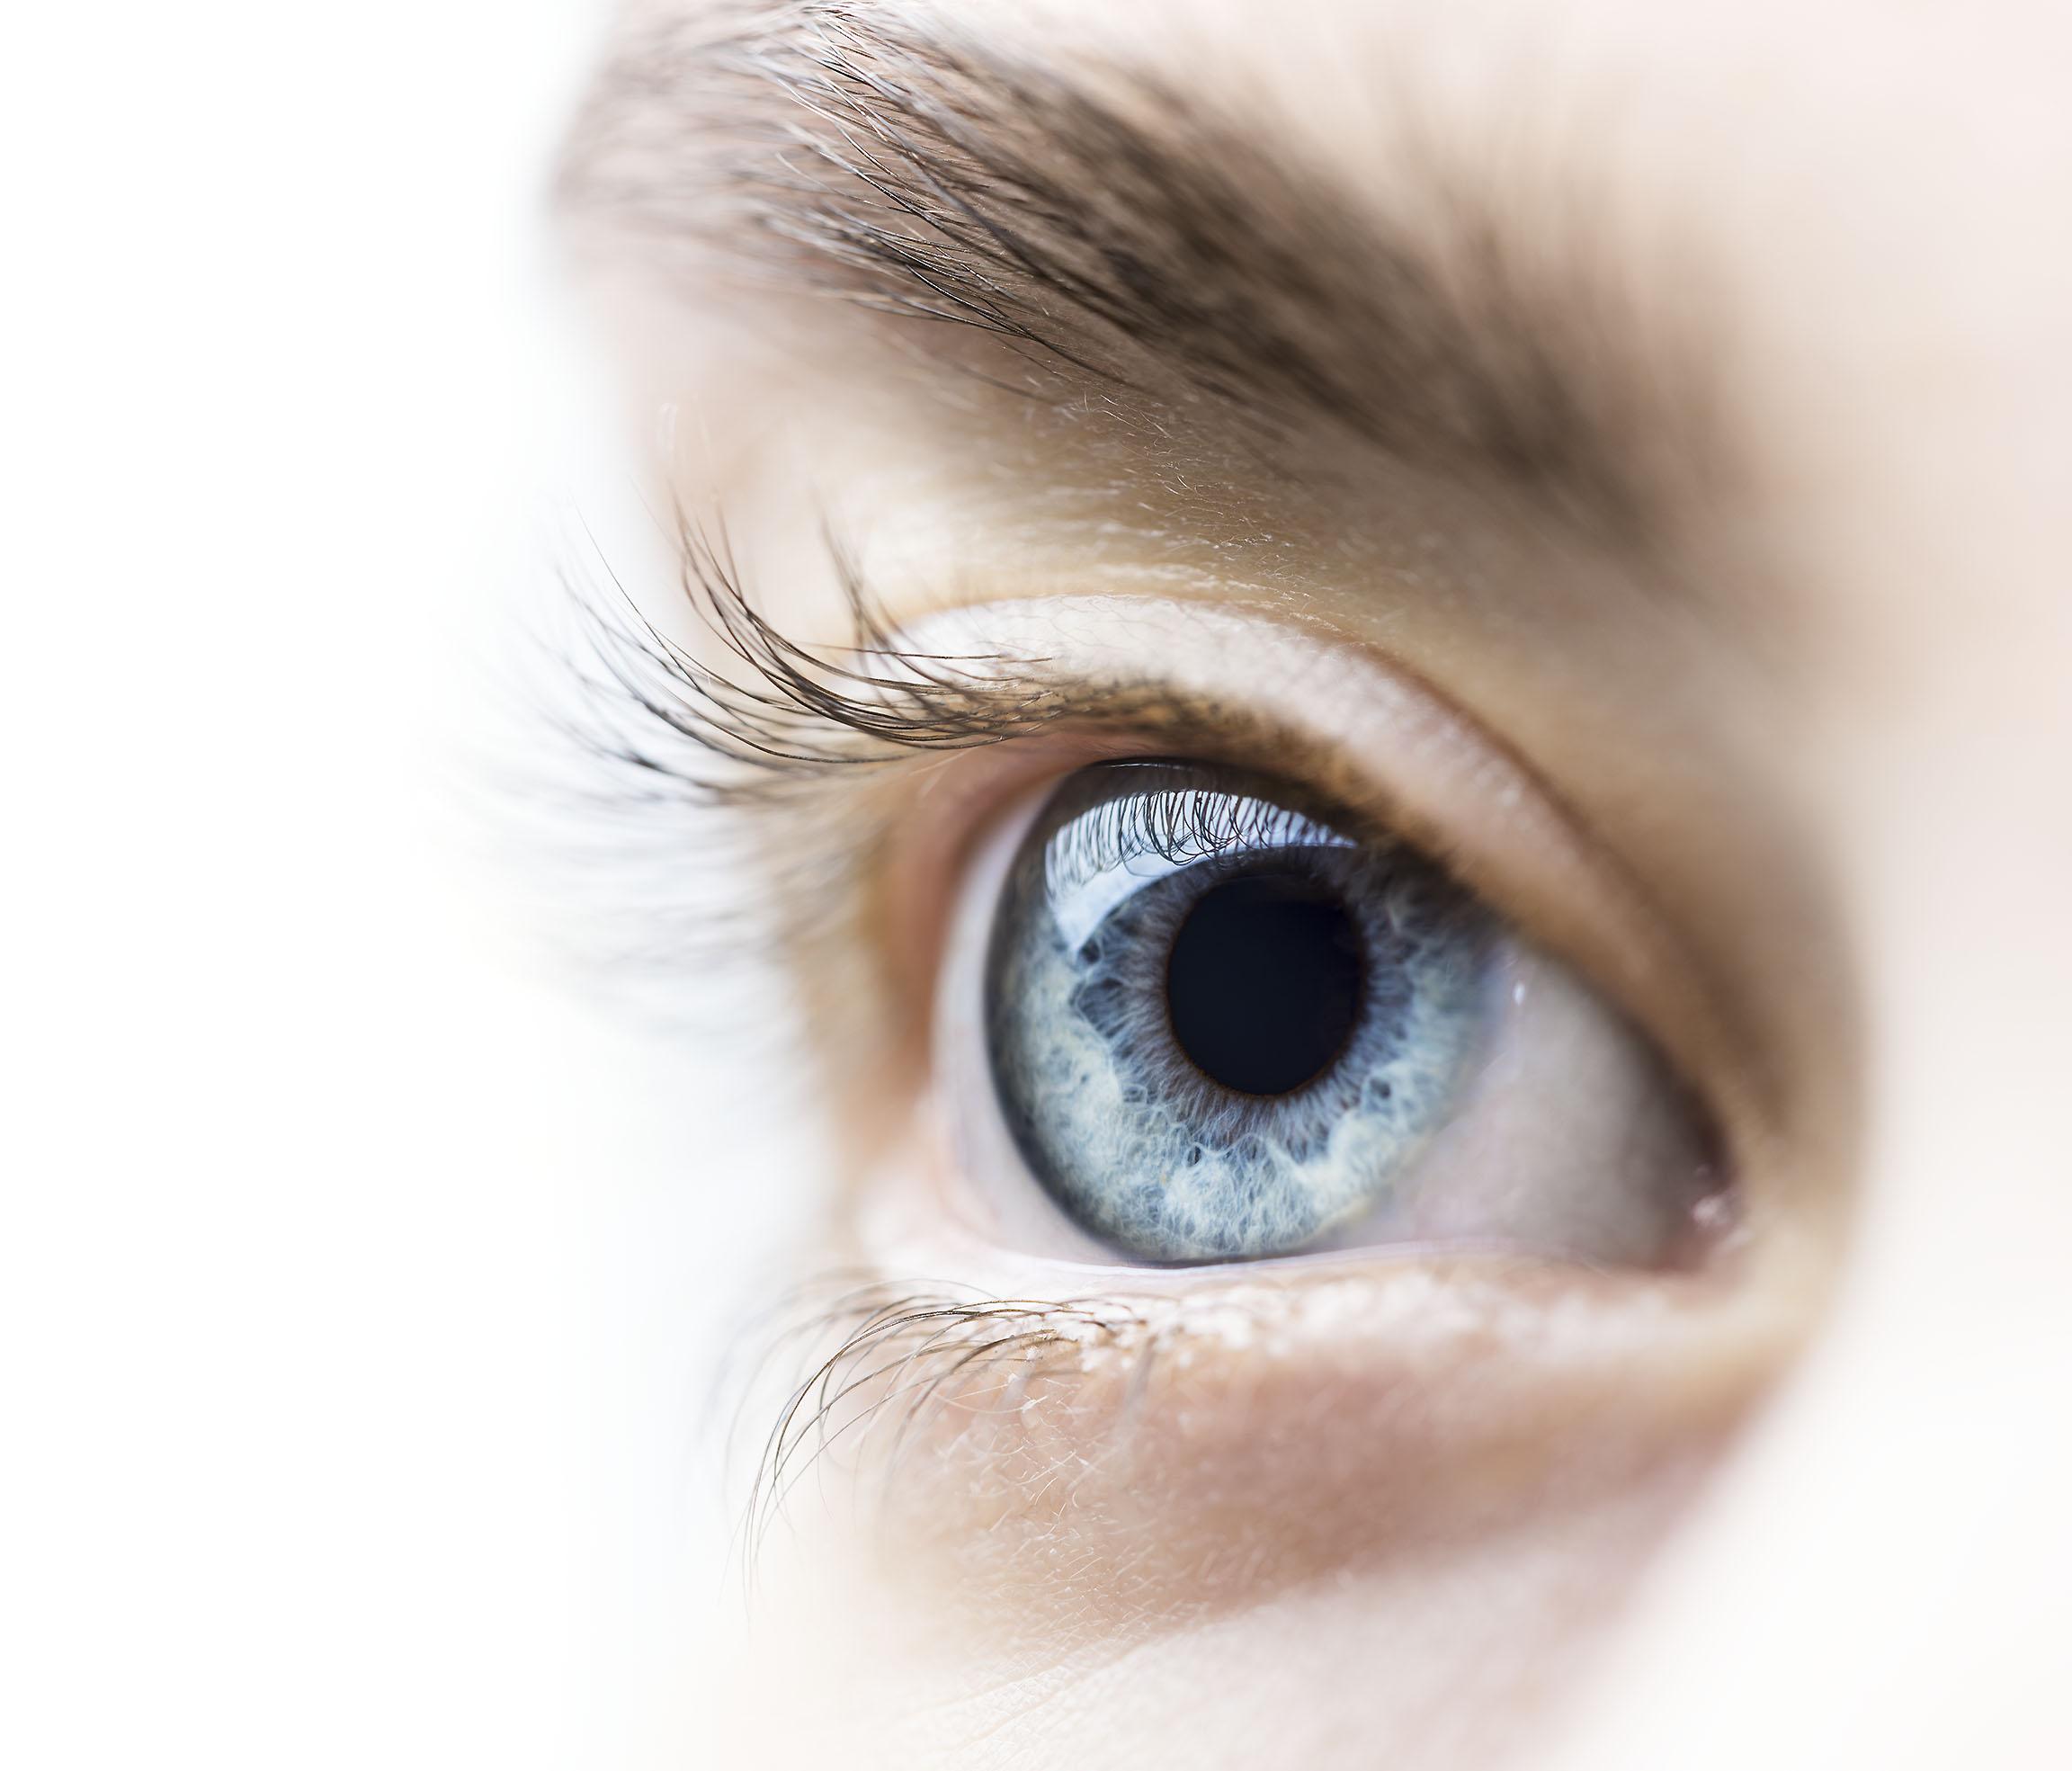 Arthur Los Fotografie - Eyeclinic Leuven